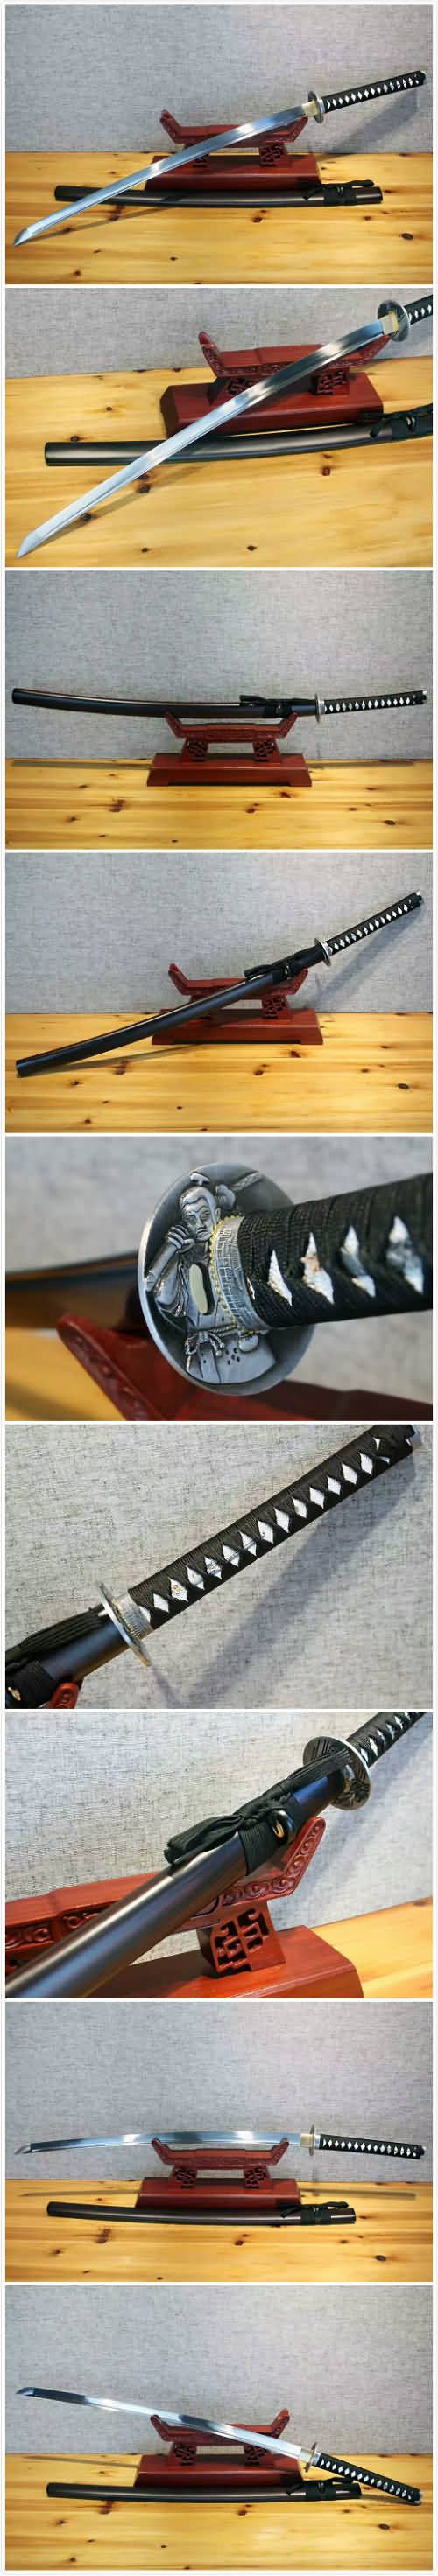 www.chinese-sword.com